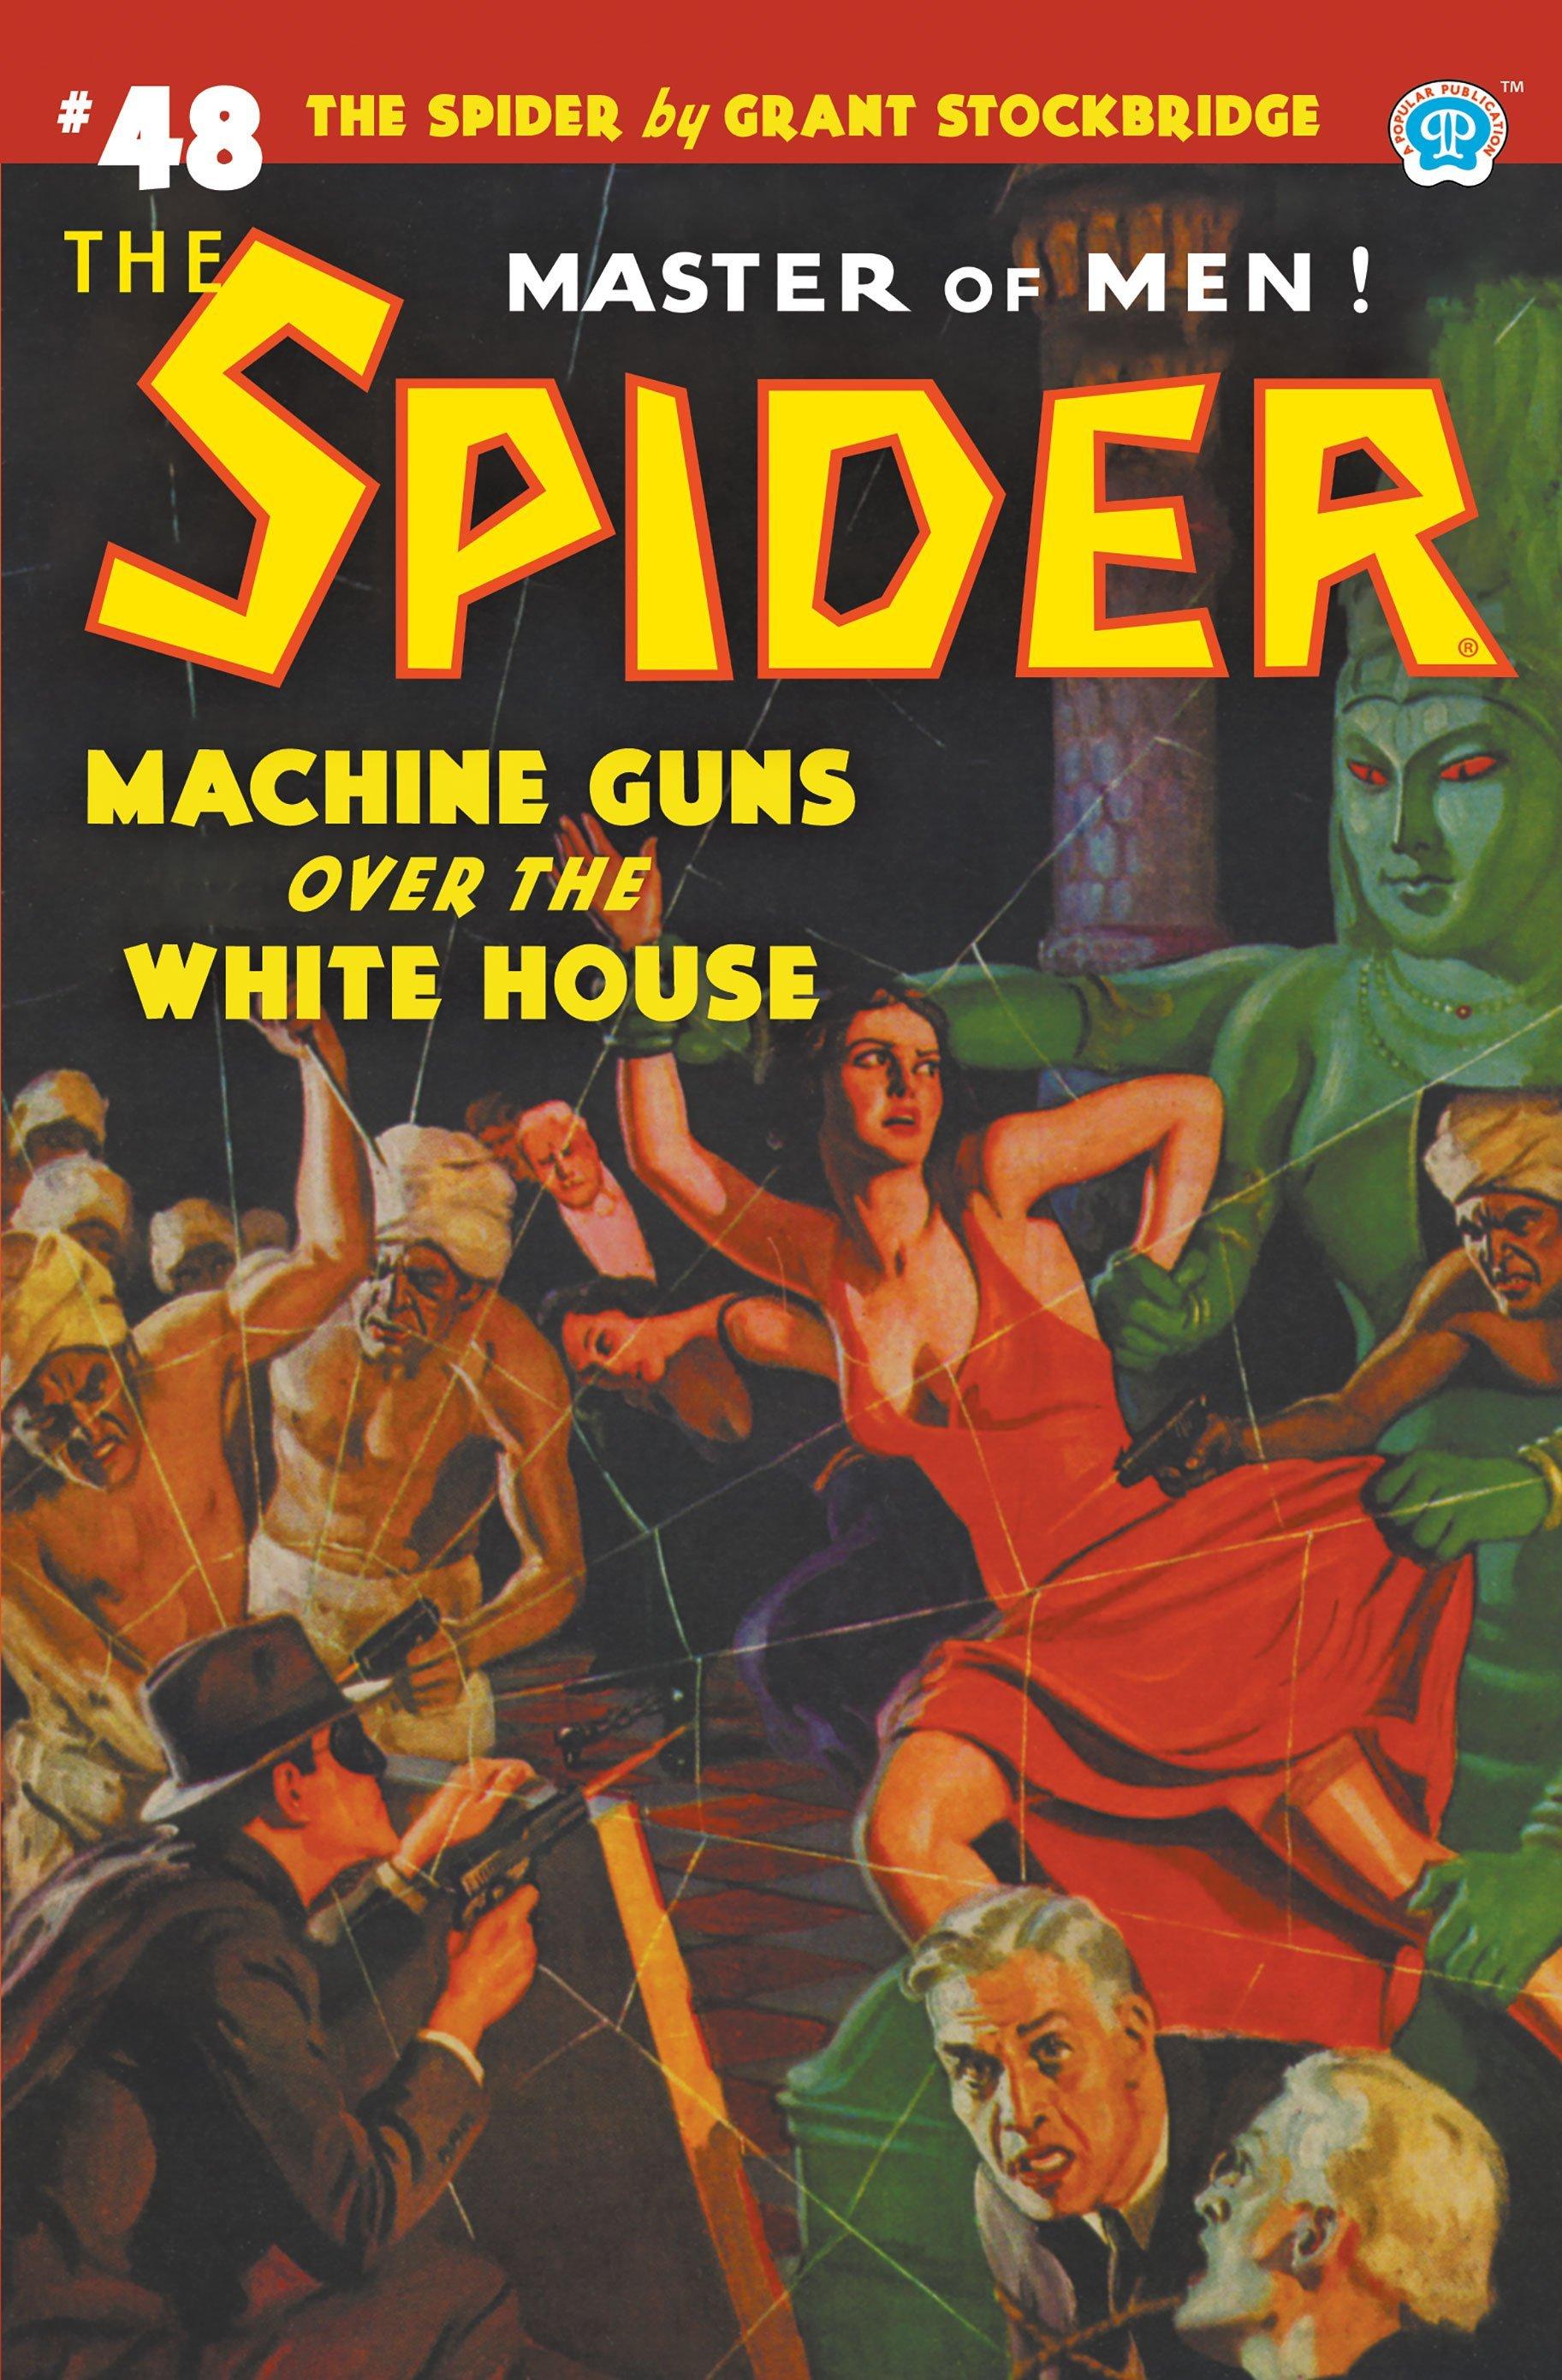 The Spider #48: Machine Guns Over the White House